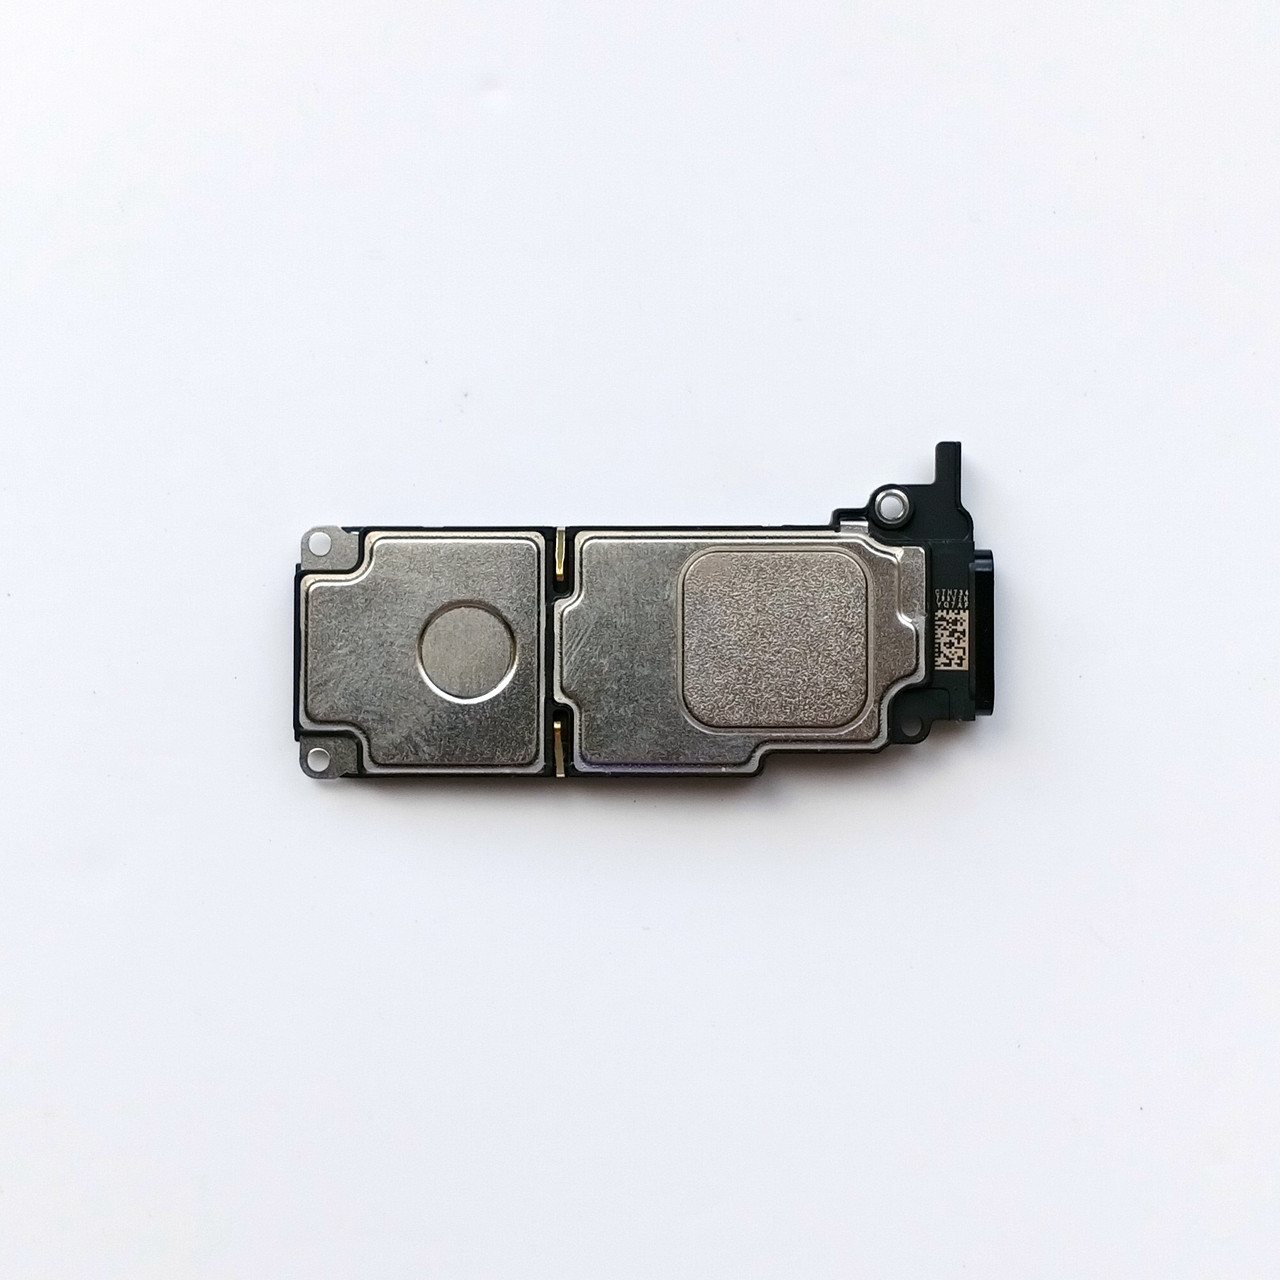 Звонок Novacel для Apple iPhone 8 Plus